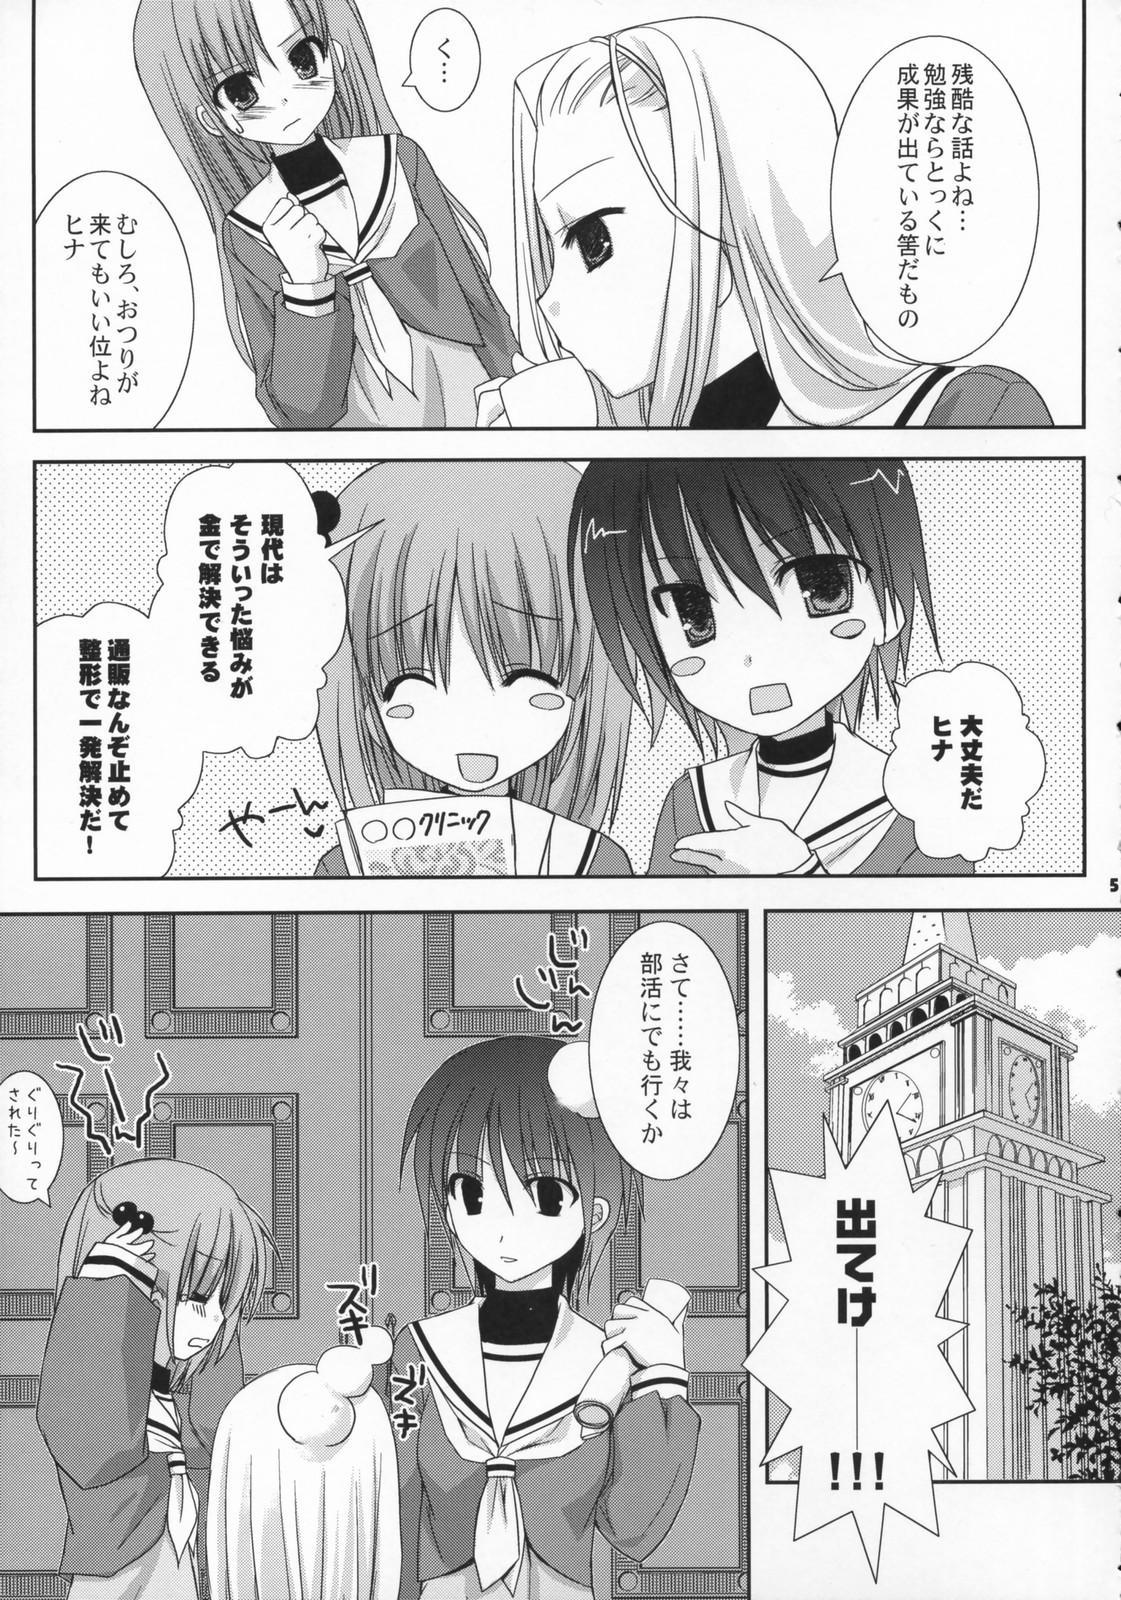 Tokimeki to Kiss 3